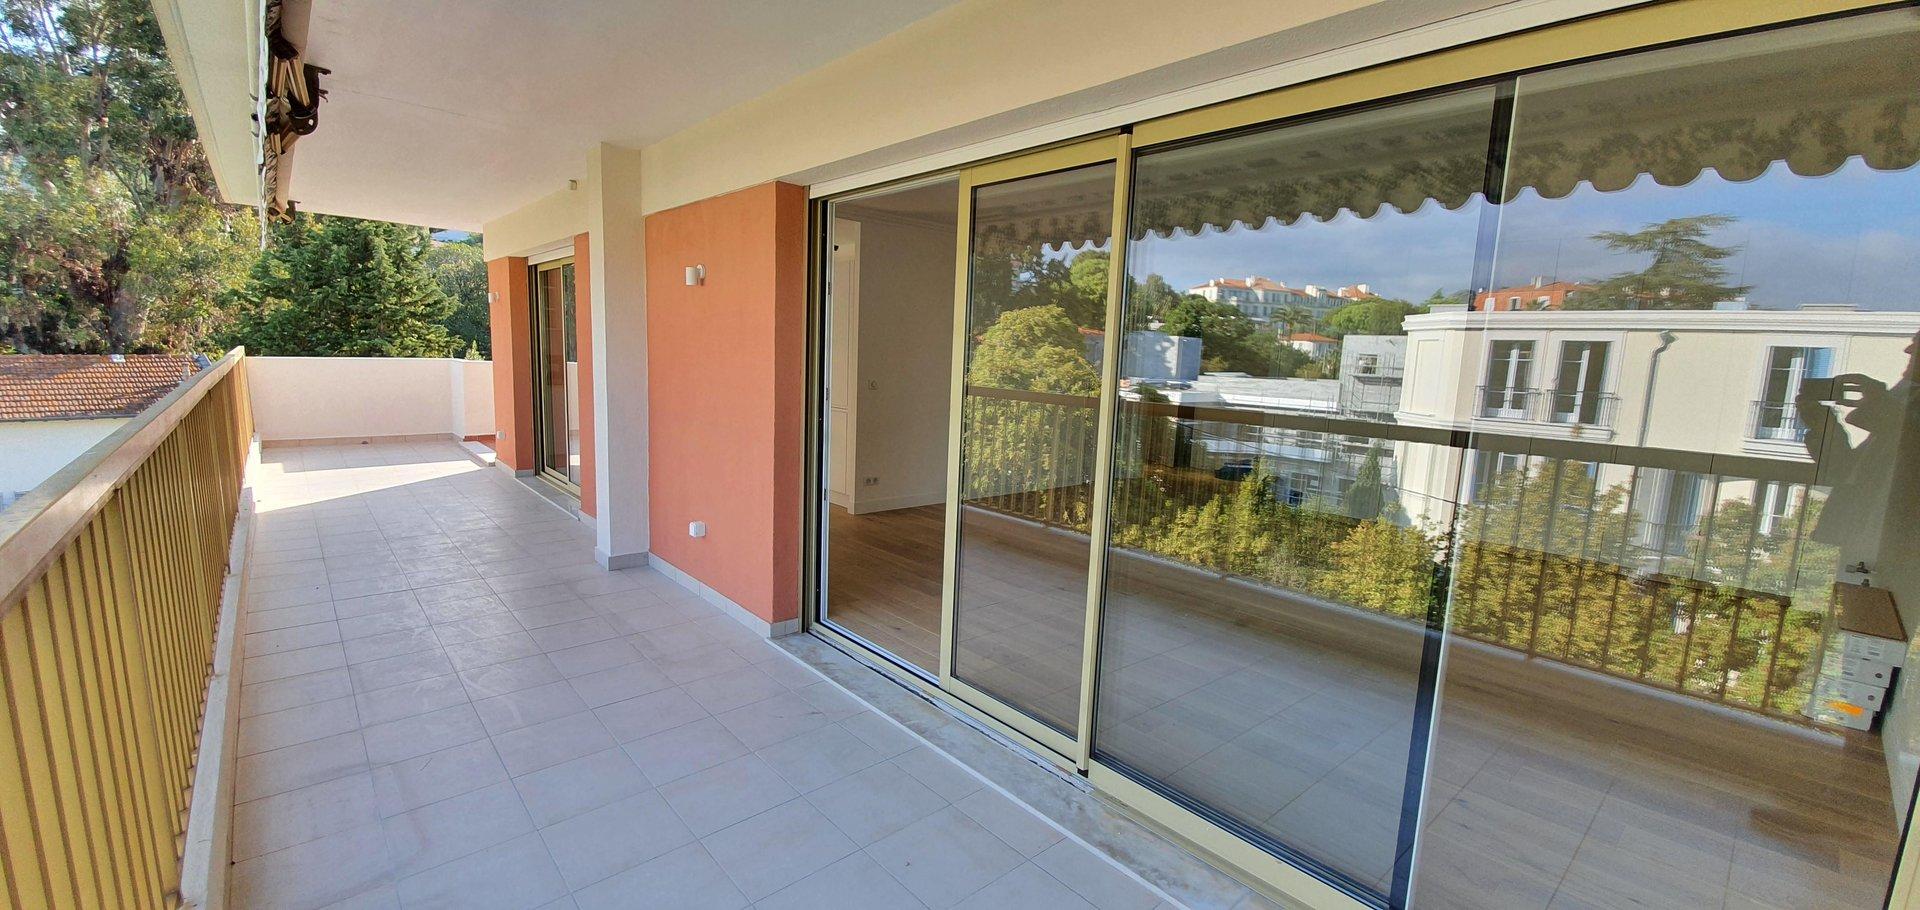 Basse Californie 2-bedroom Top Floor apartment 55 sqm of terraces and Garage